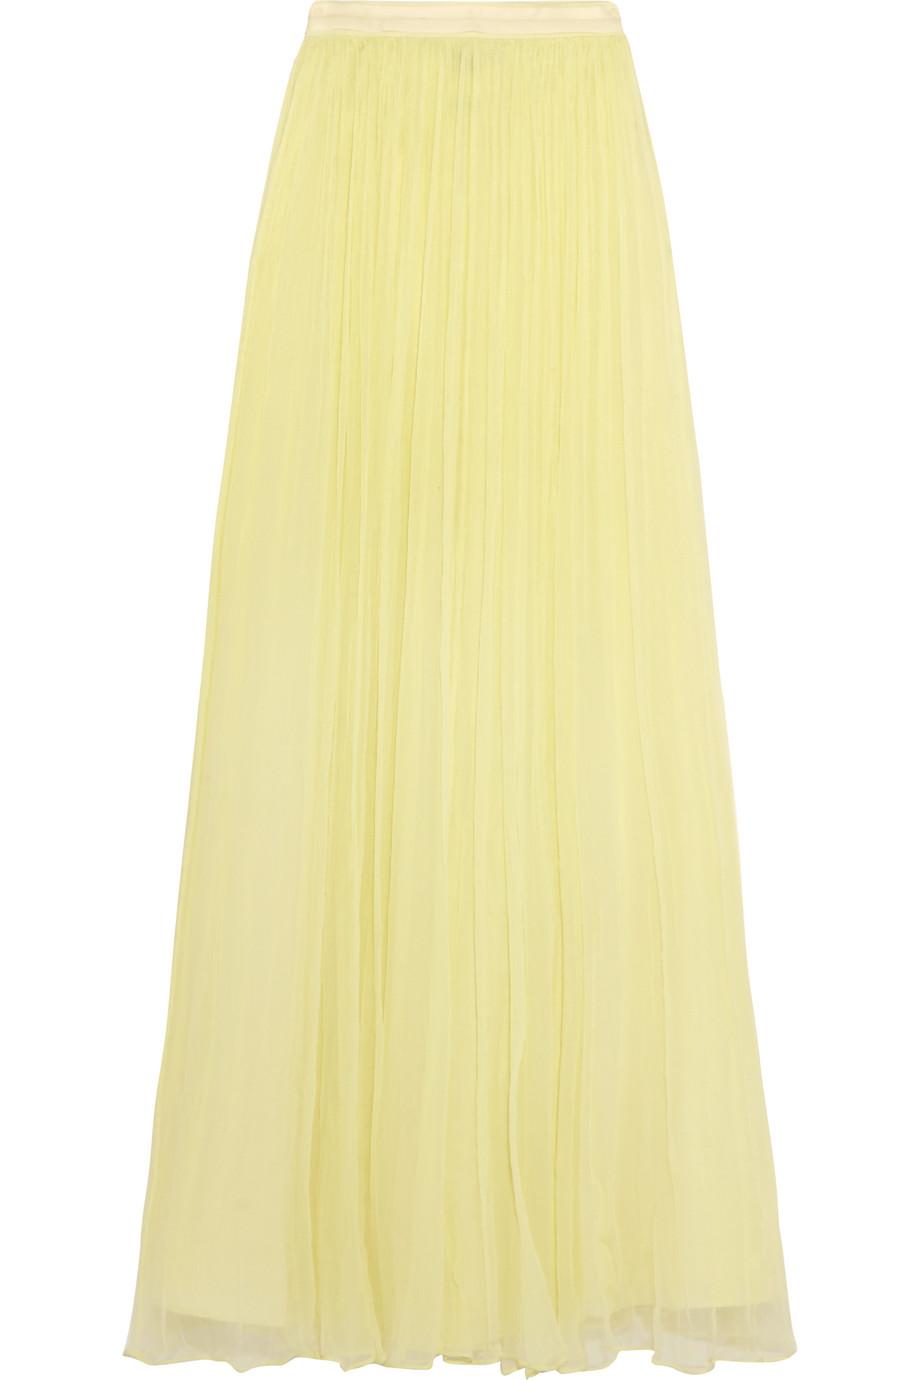 Needle & Thread Crinkled-Chiffon Maxi Skirt, Pastel Yellow, Women's, Size: 12